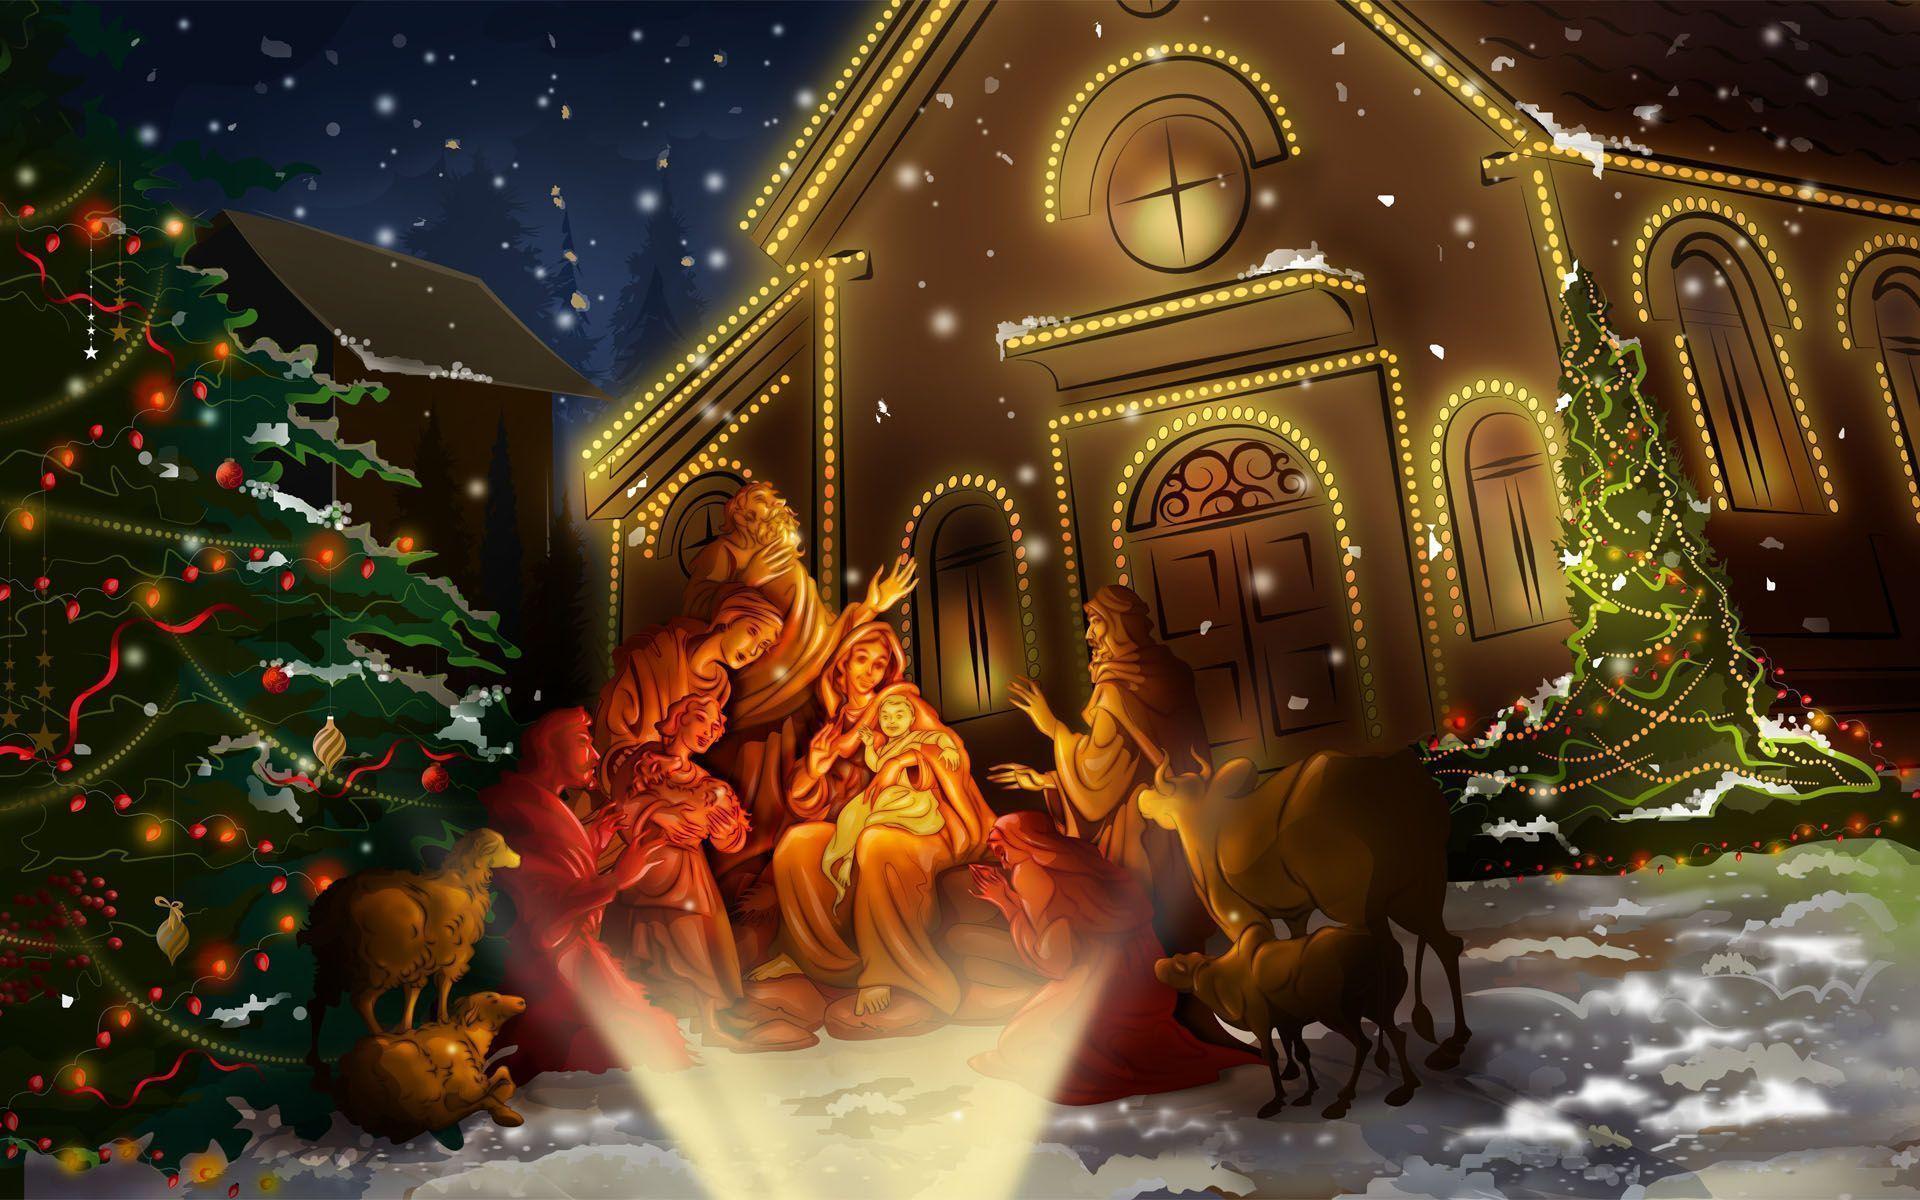 celebrating jesus birth wallpapers hd wallpapers